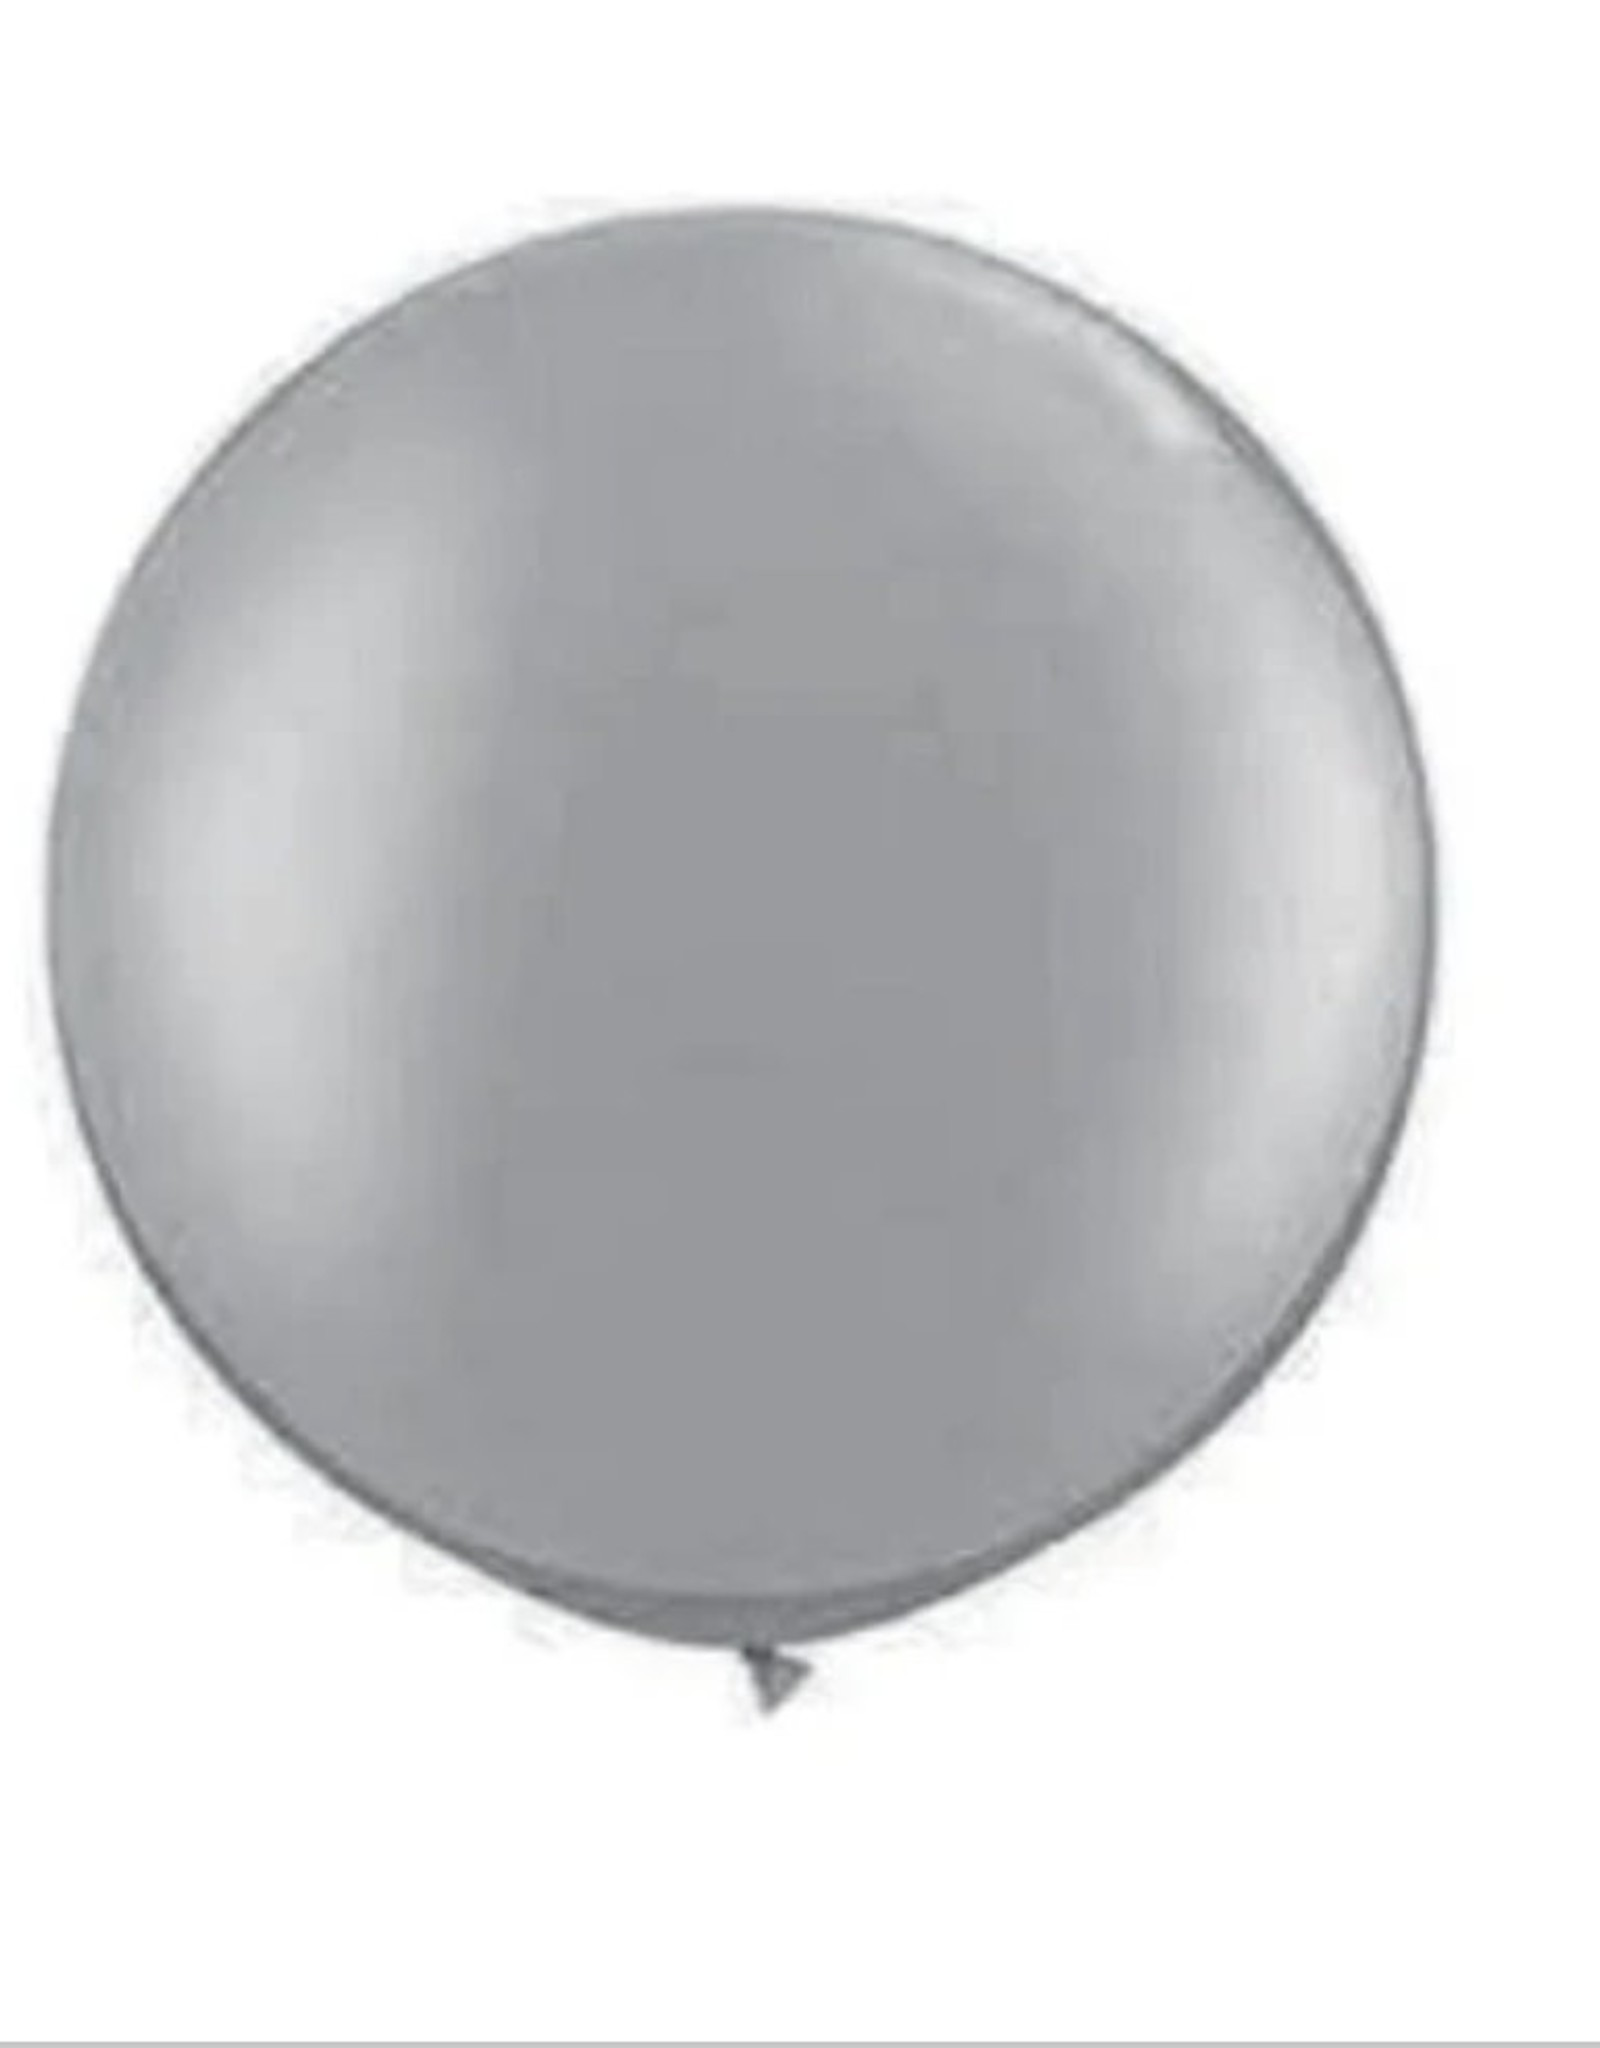 "Giant Latex Balloons, Metallic Silver 30"" (2pcs)"